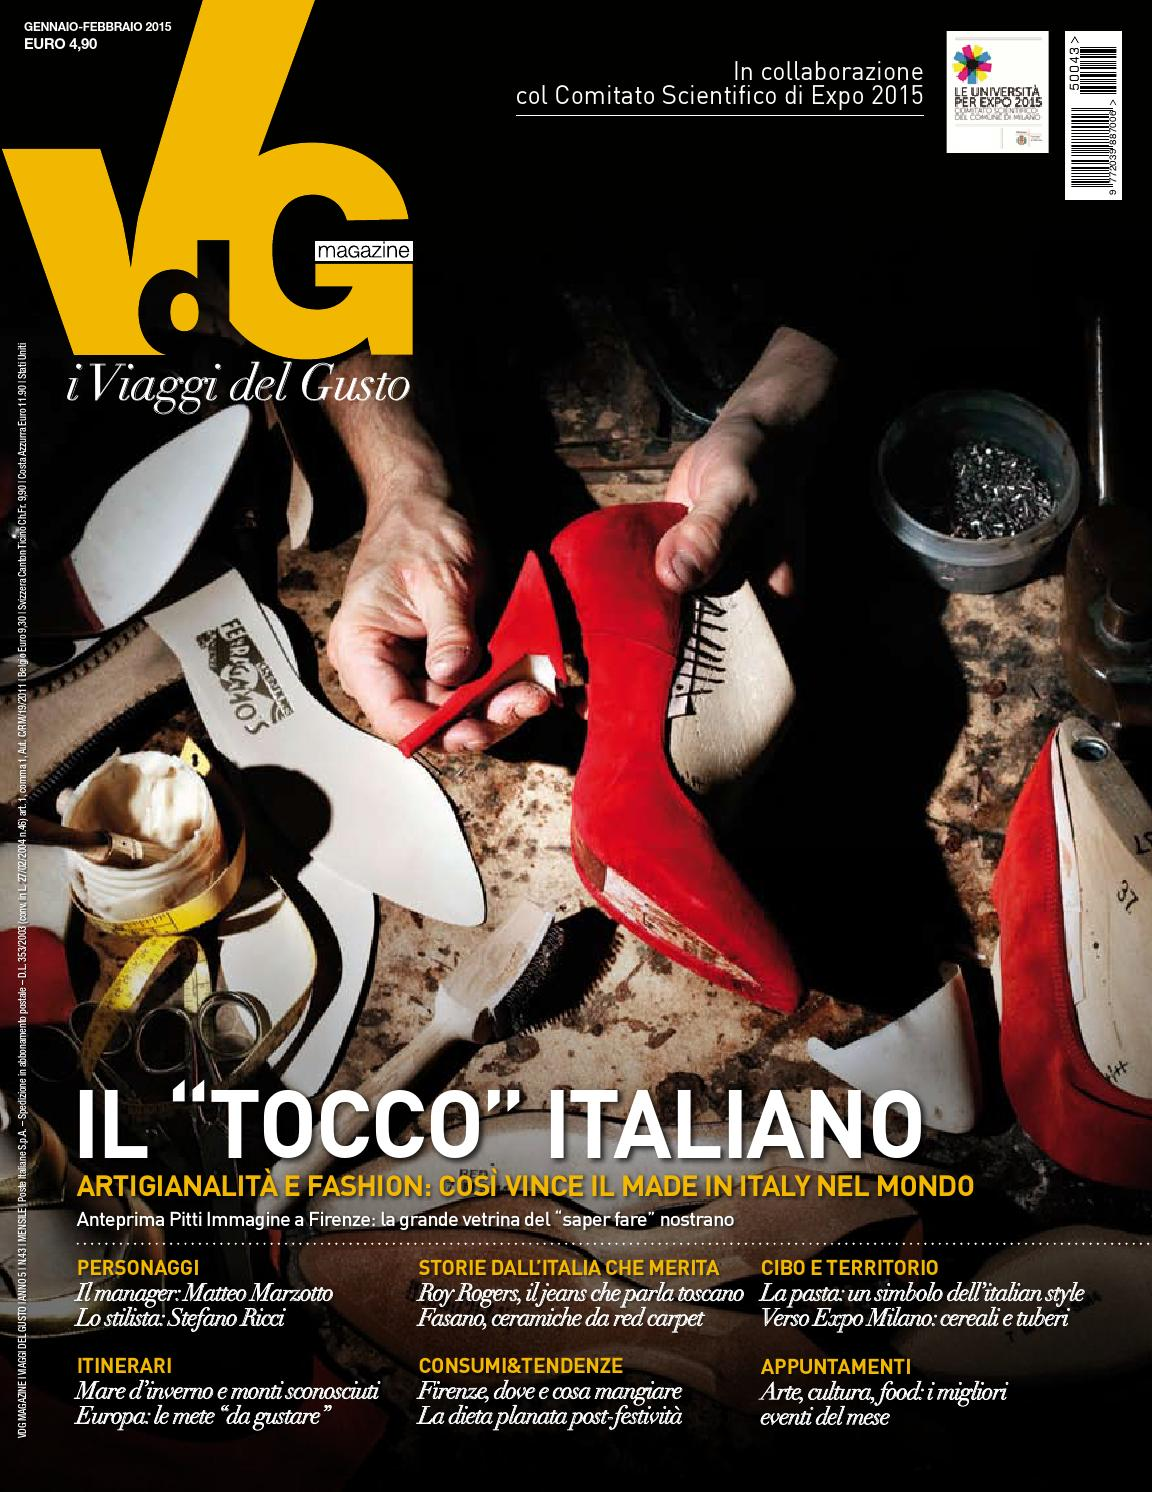 VdG i Viaggi del Gusto - Gennaio Febbraio 2015 by vdgmagazine - issuu 6ca75c9a5205